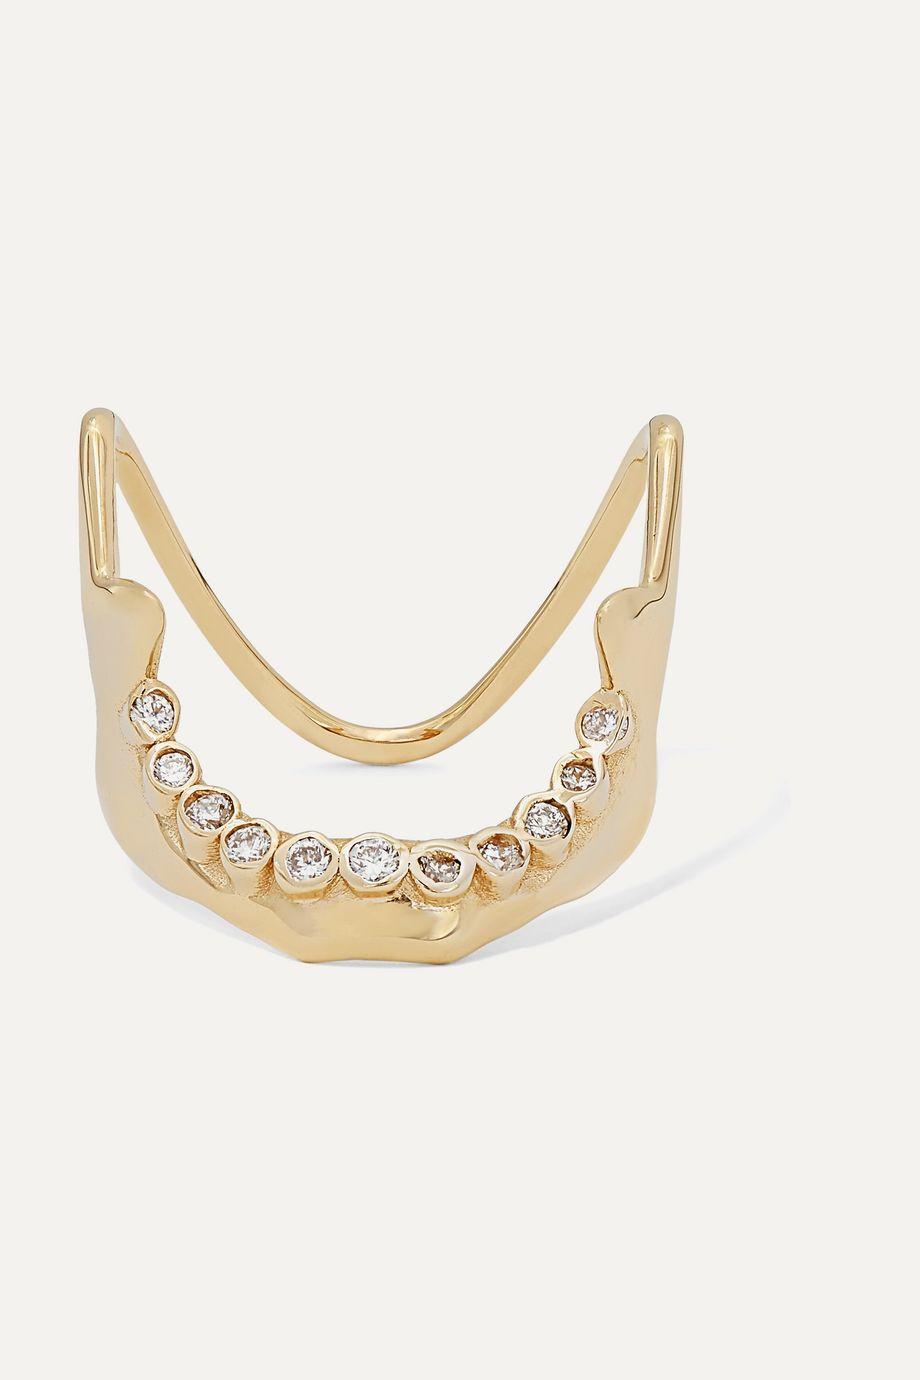 SARAH & SEBASTIAN Mandible 10-karat gold diamond ring